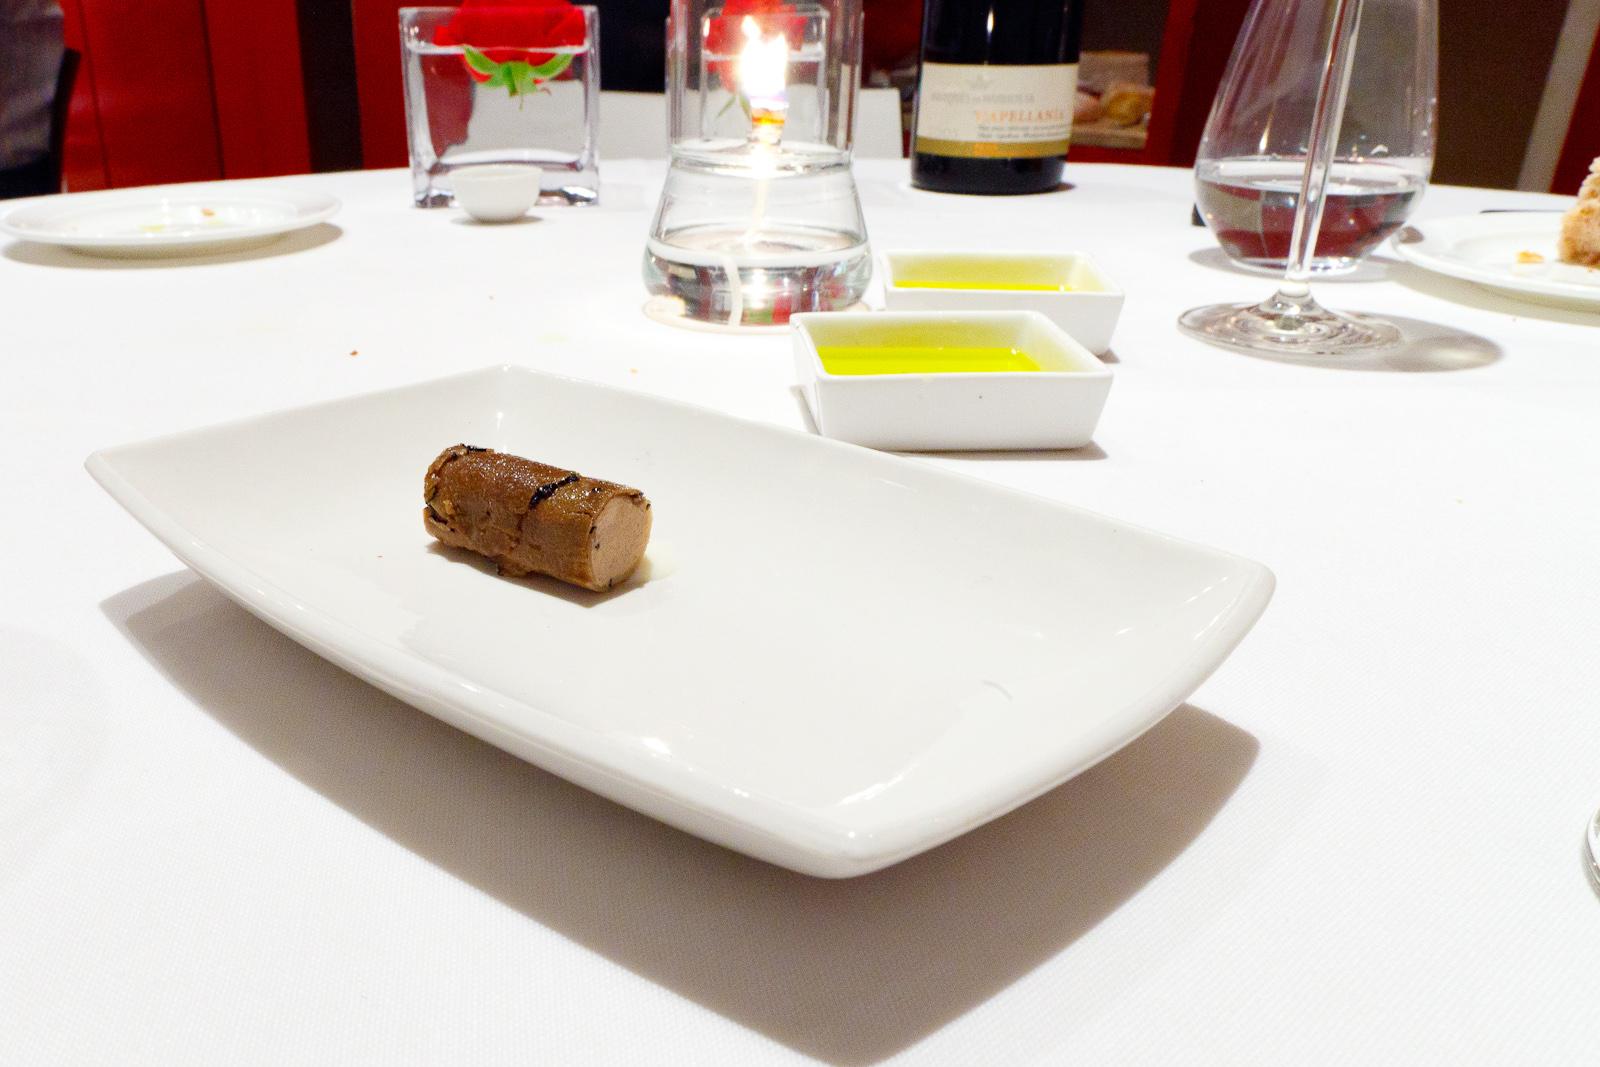 Hisop, Spain - Rabbit terrine and summer truffle